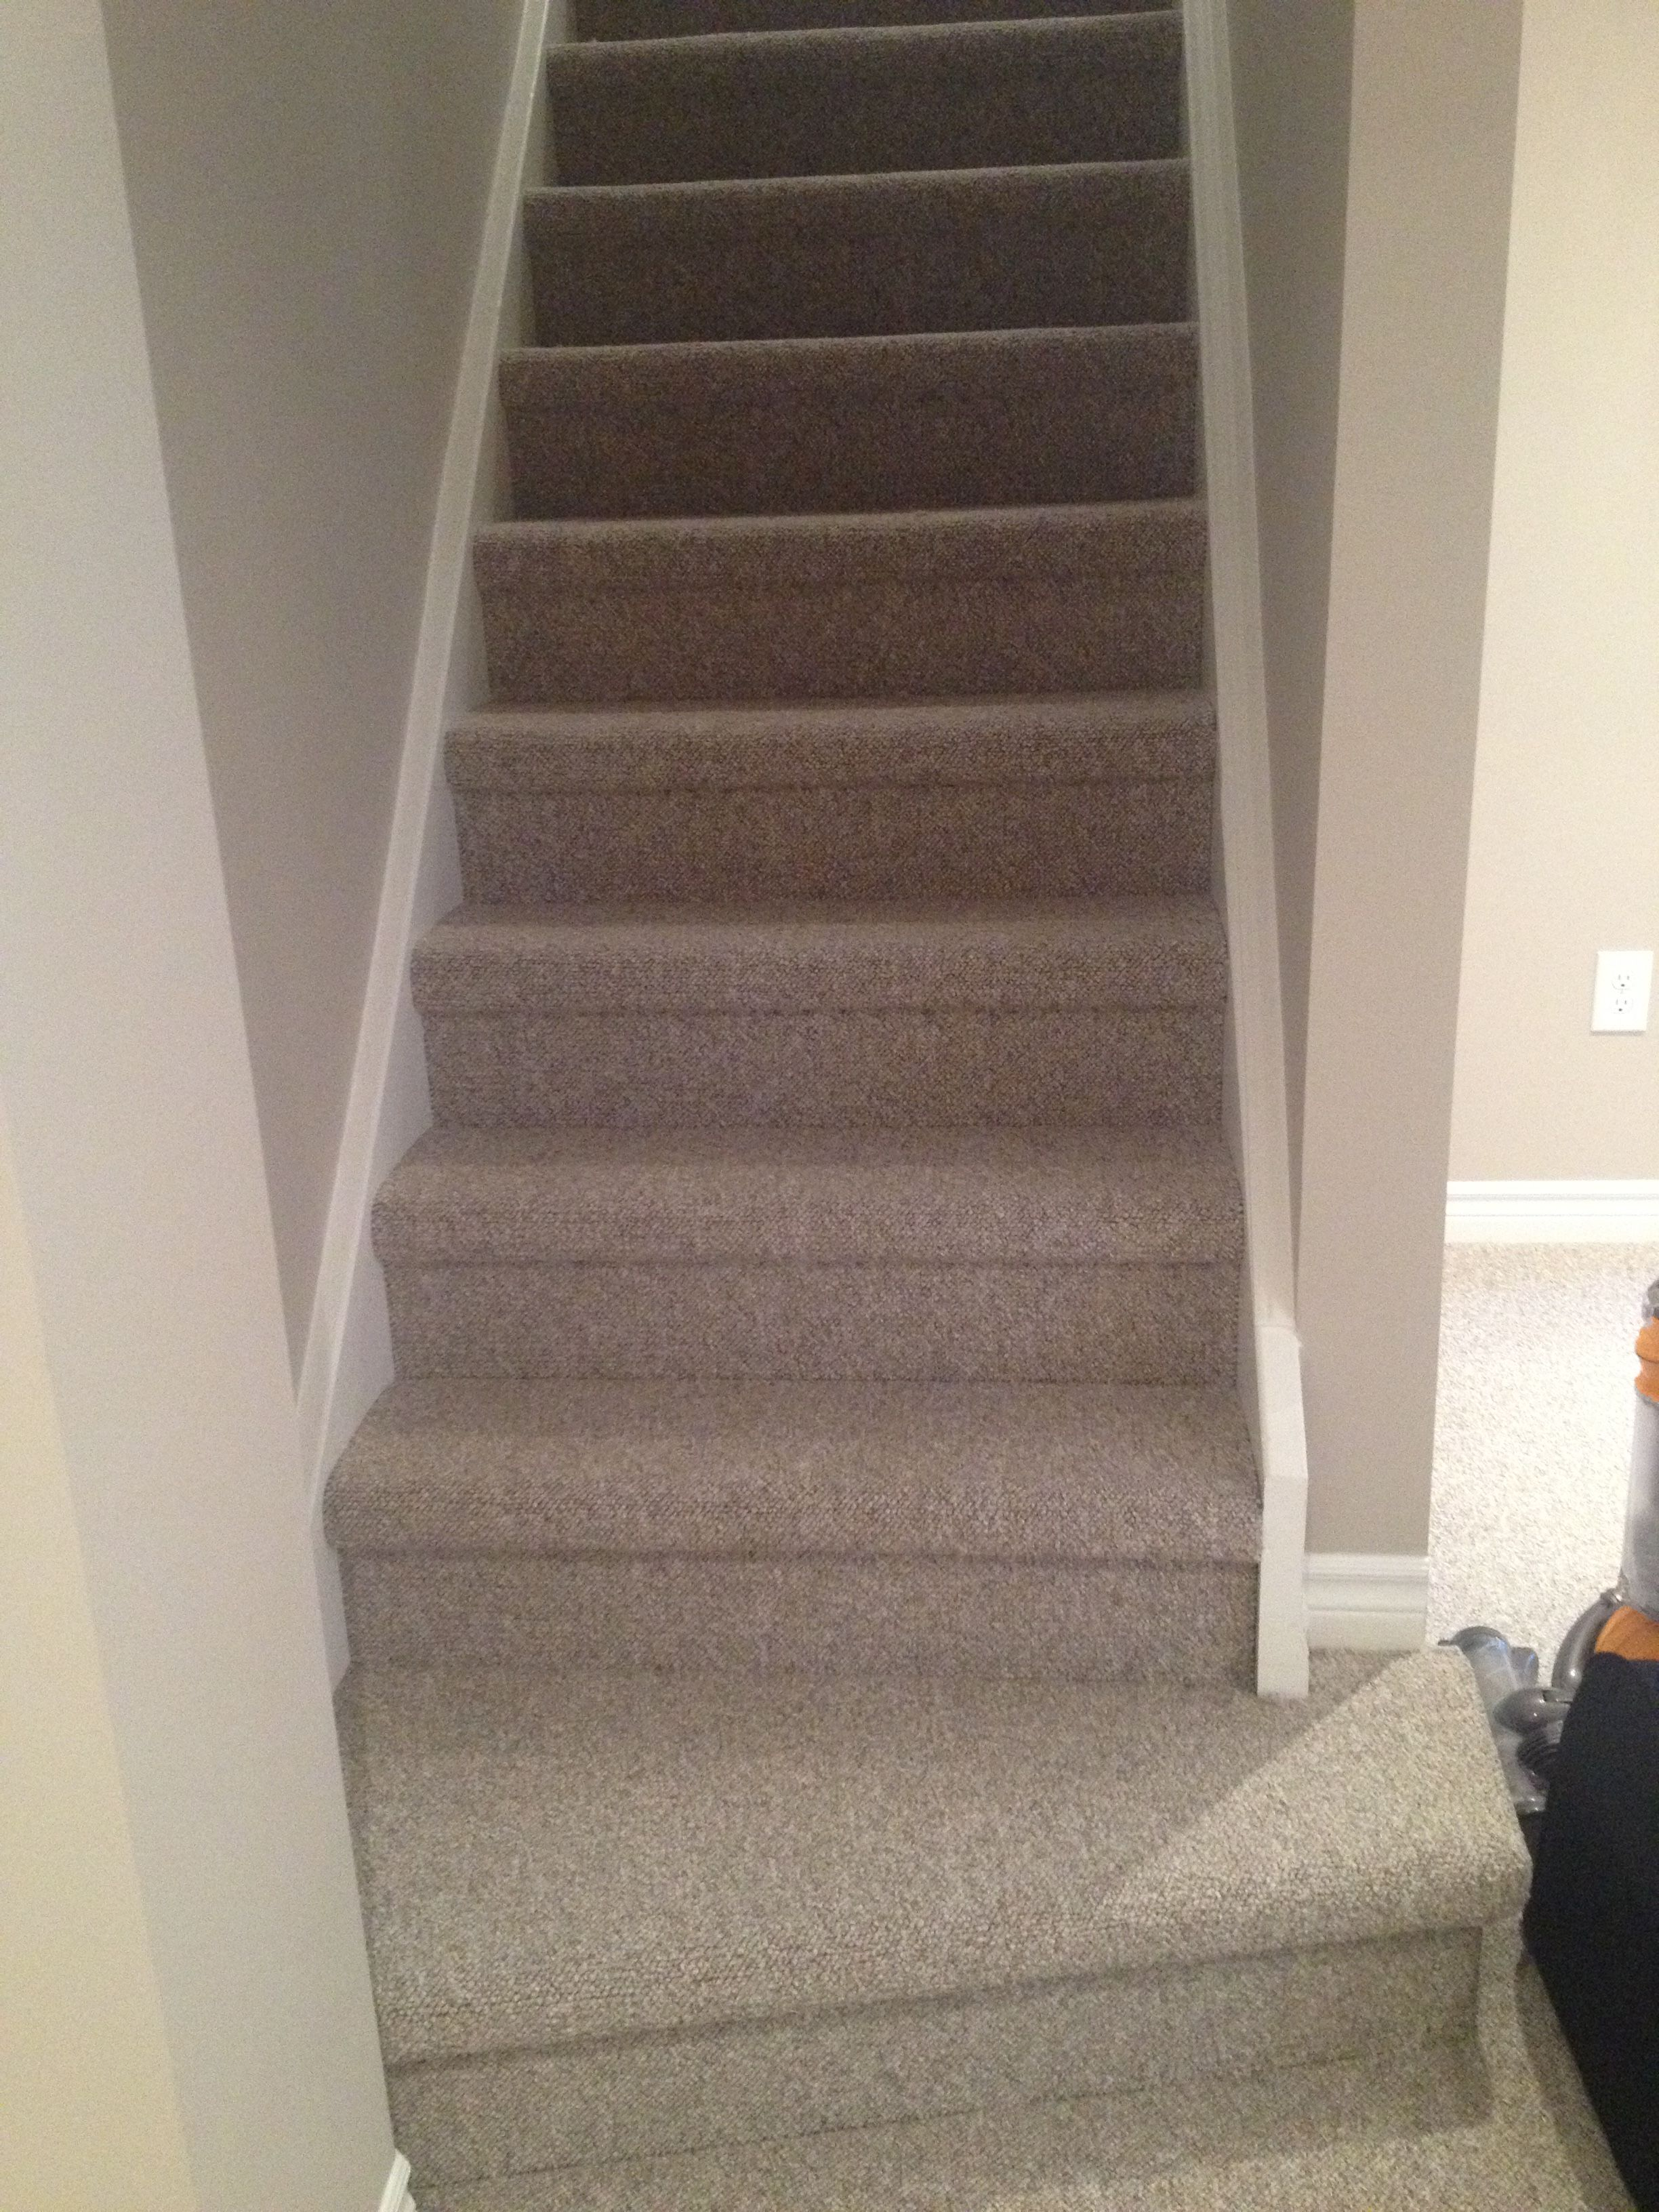 Berber Carpet On Stairs Berber Carpet Carpet Stairs   Carpet Colors For Stairs